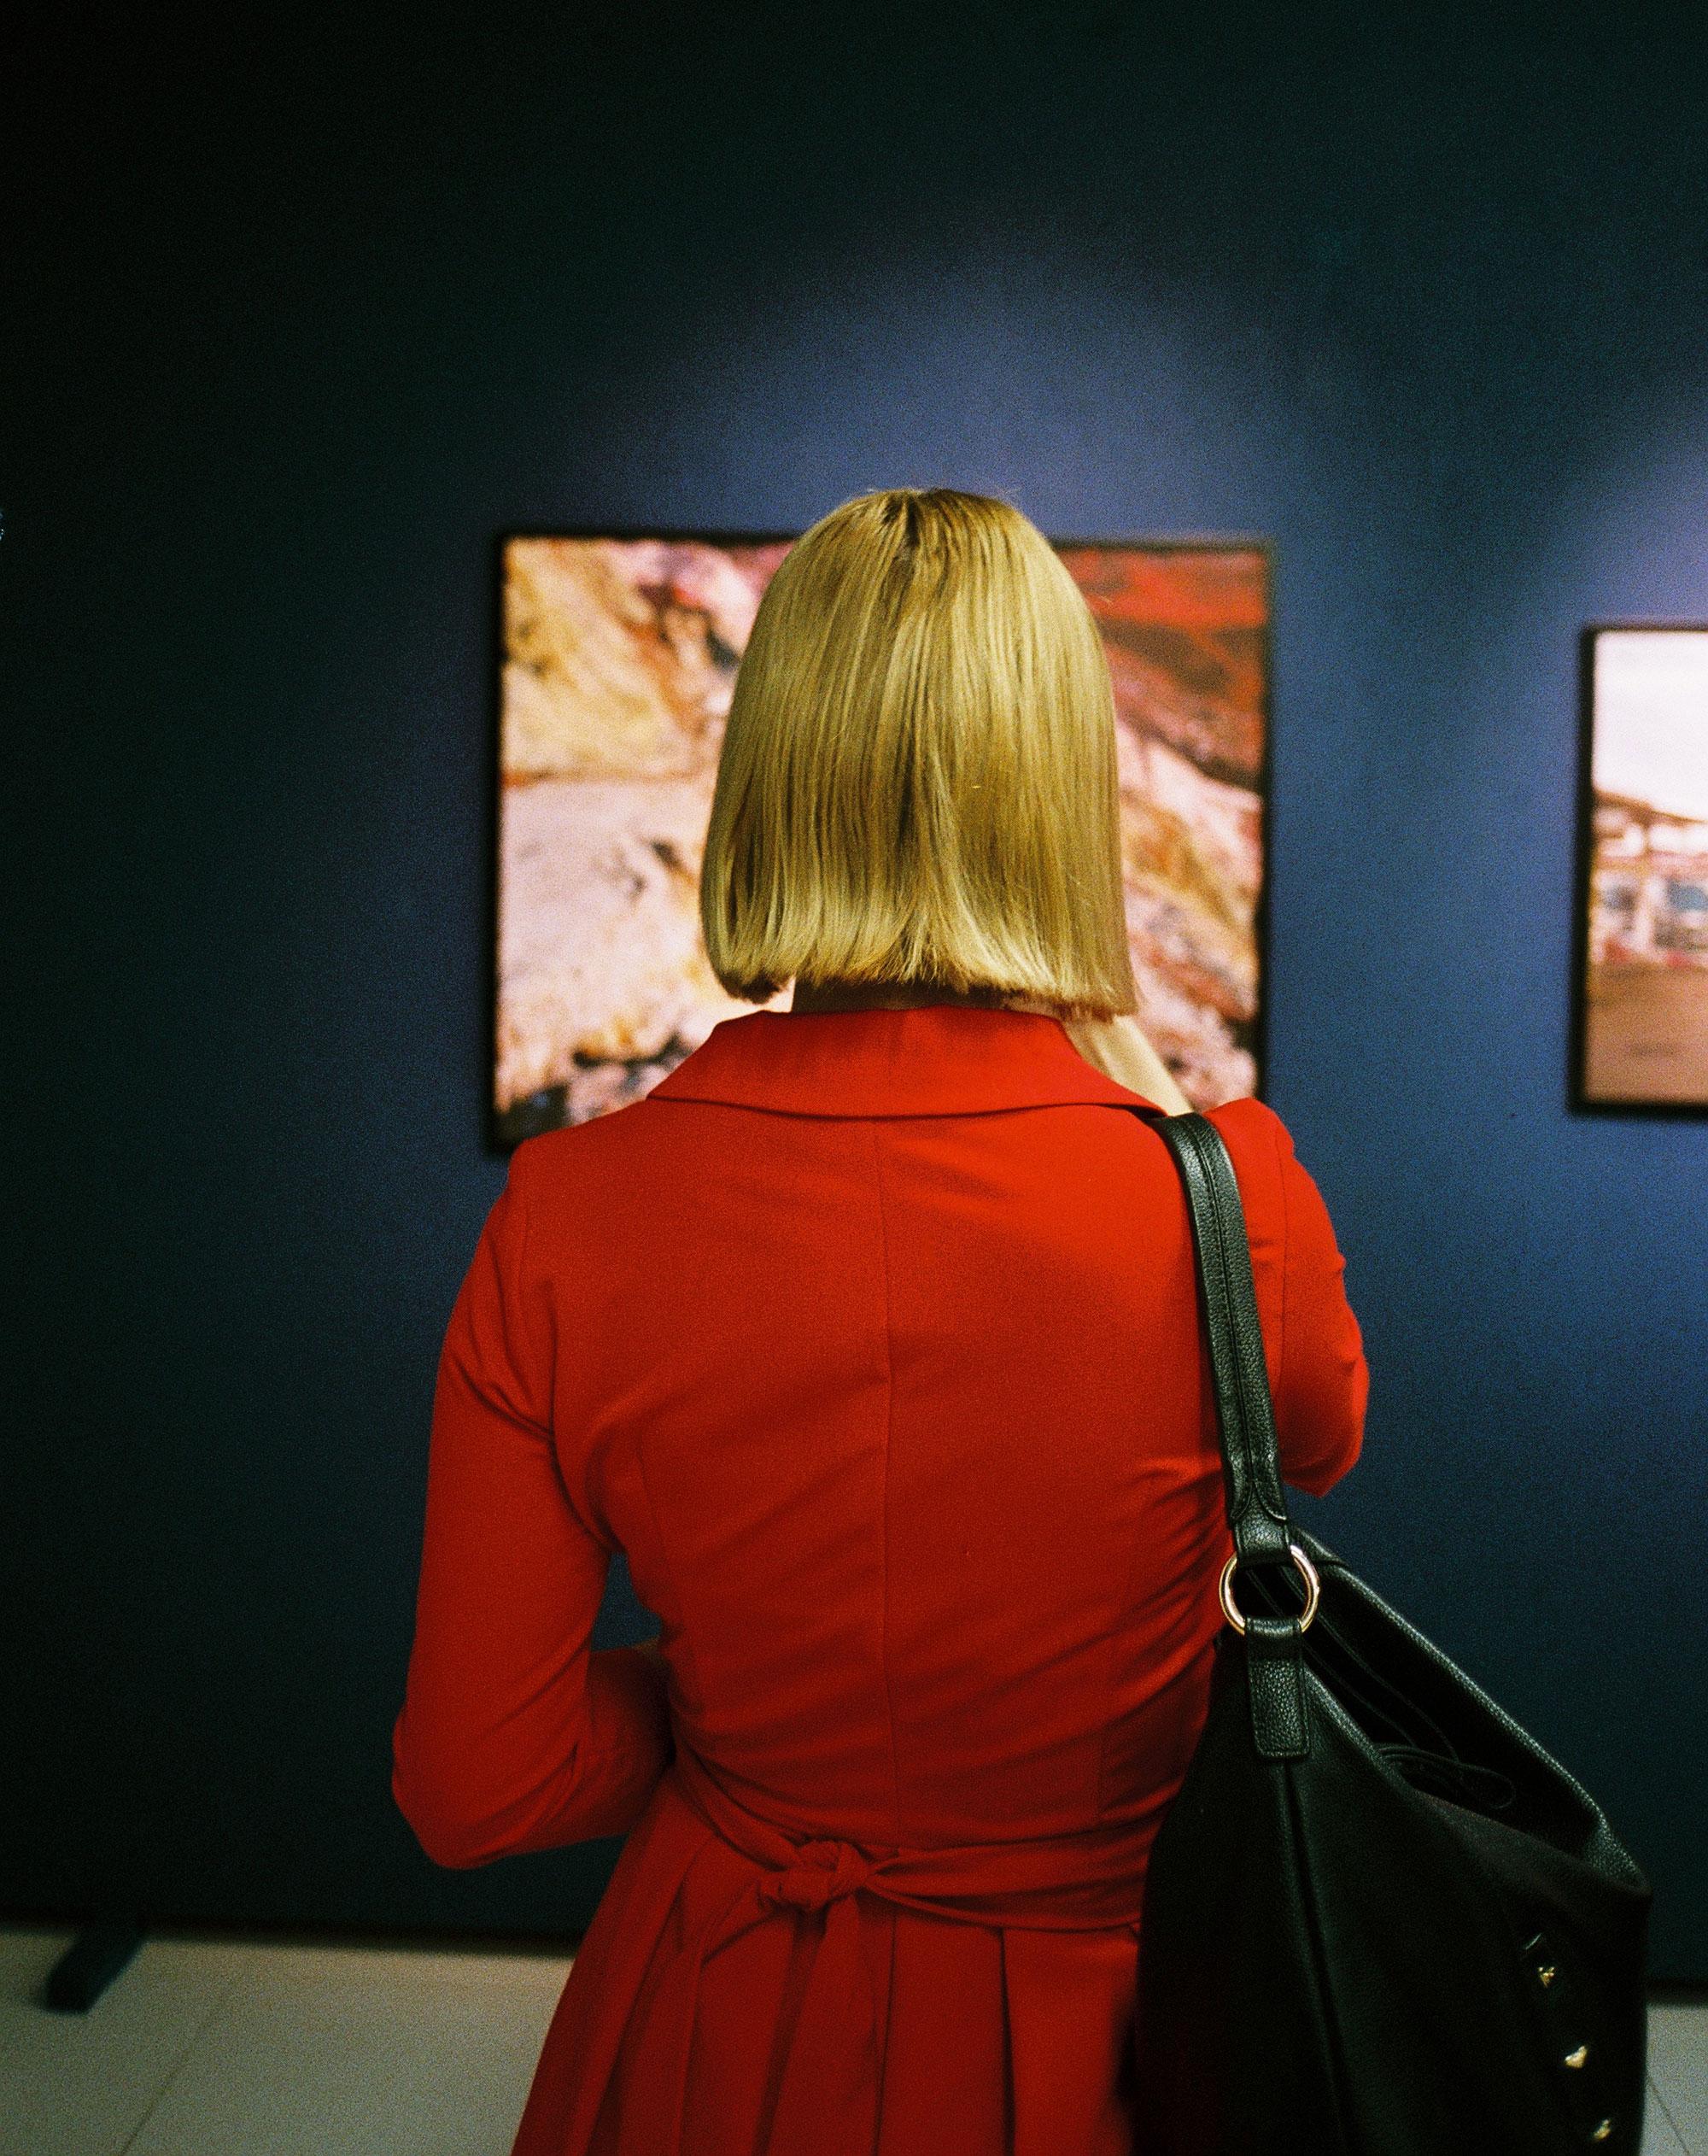 mastera-sibiri-photo-prize